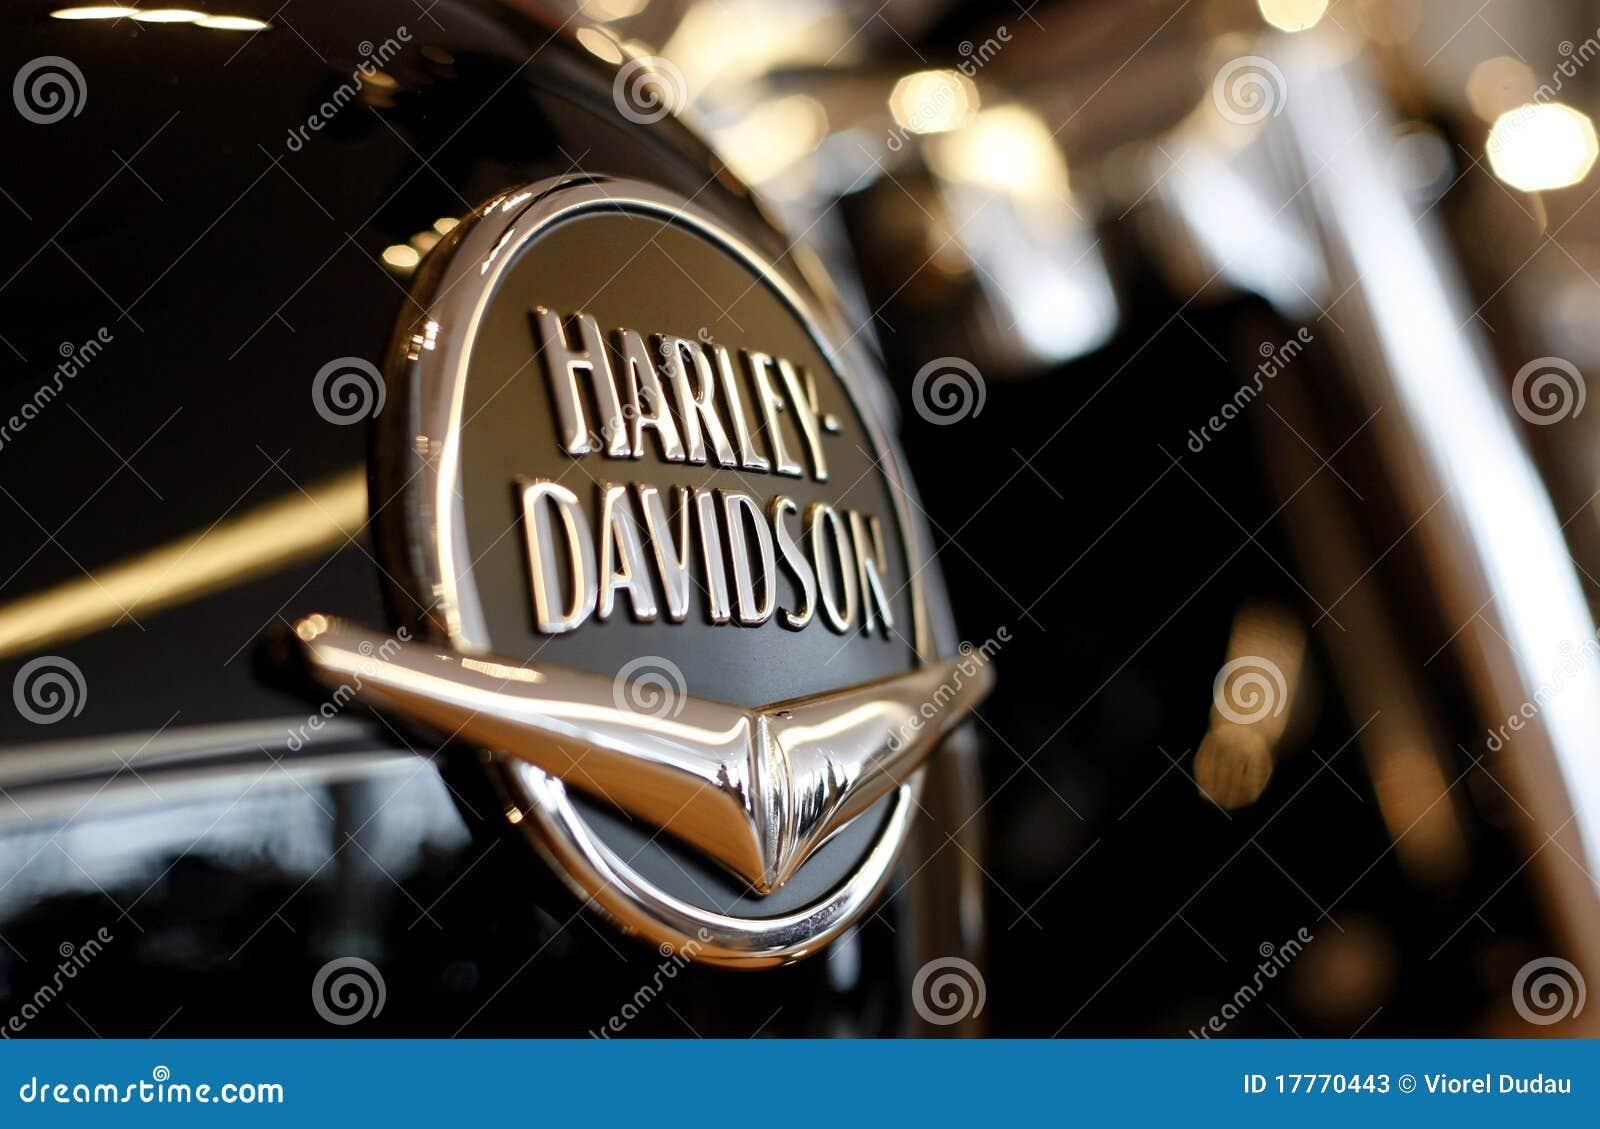 Harley davidson logo editorial stock photo image of ride 17770443 harley davidson logo voltagebd Choice Image